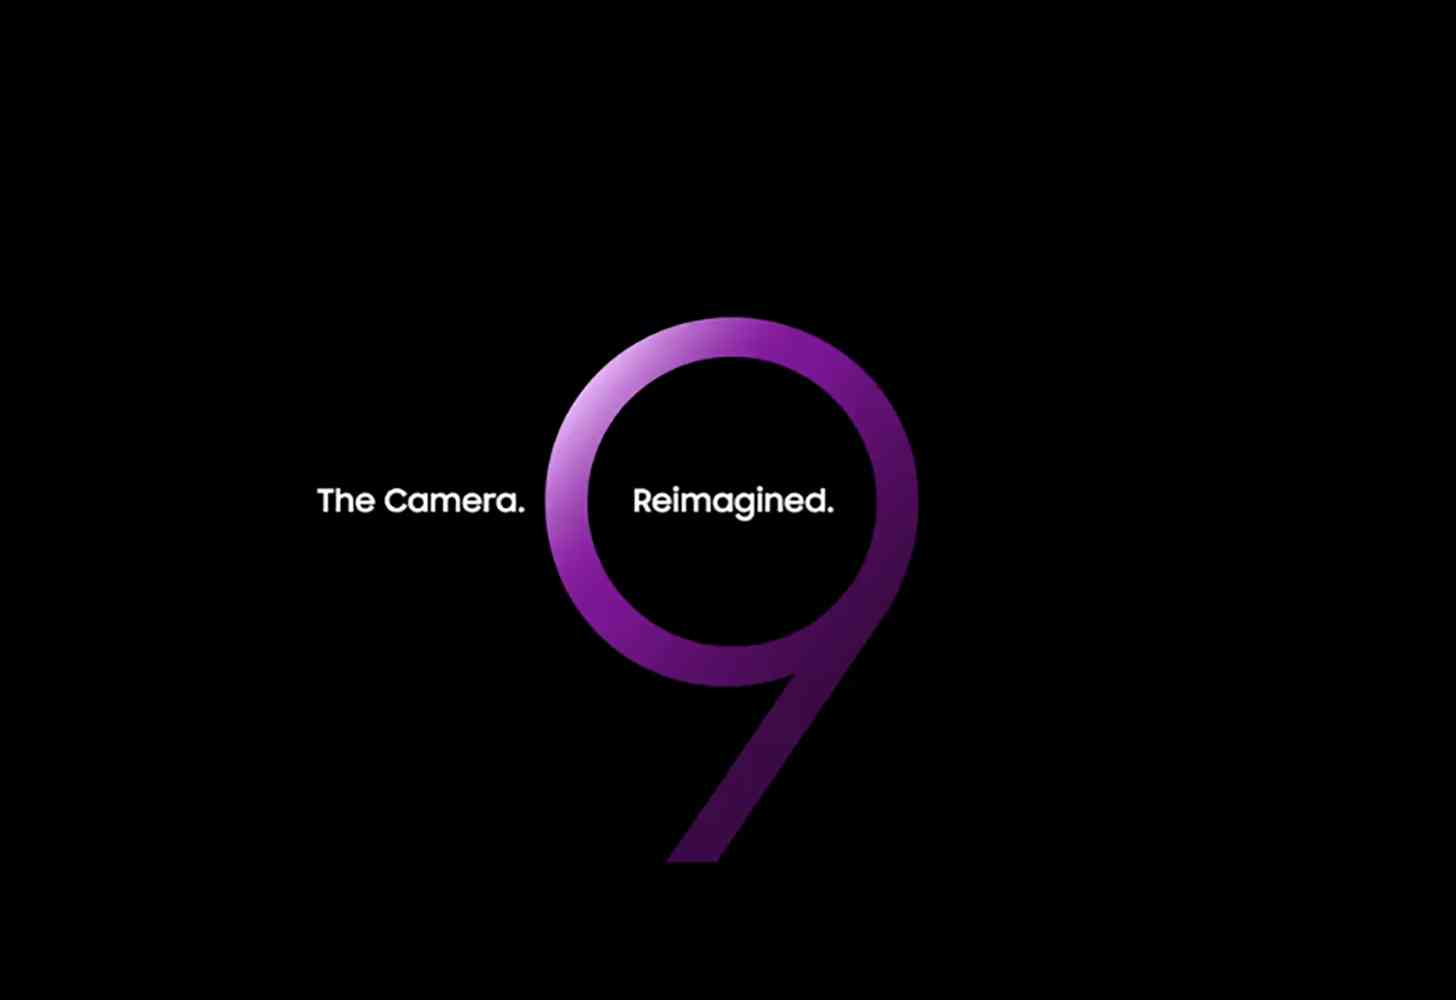 Samsung Galaxy S9 announcement teaser image